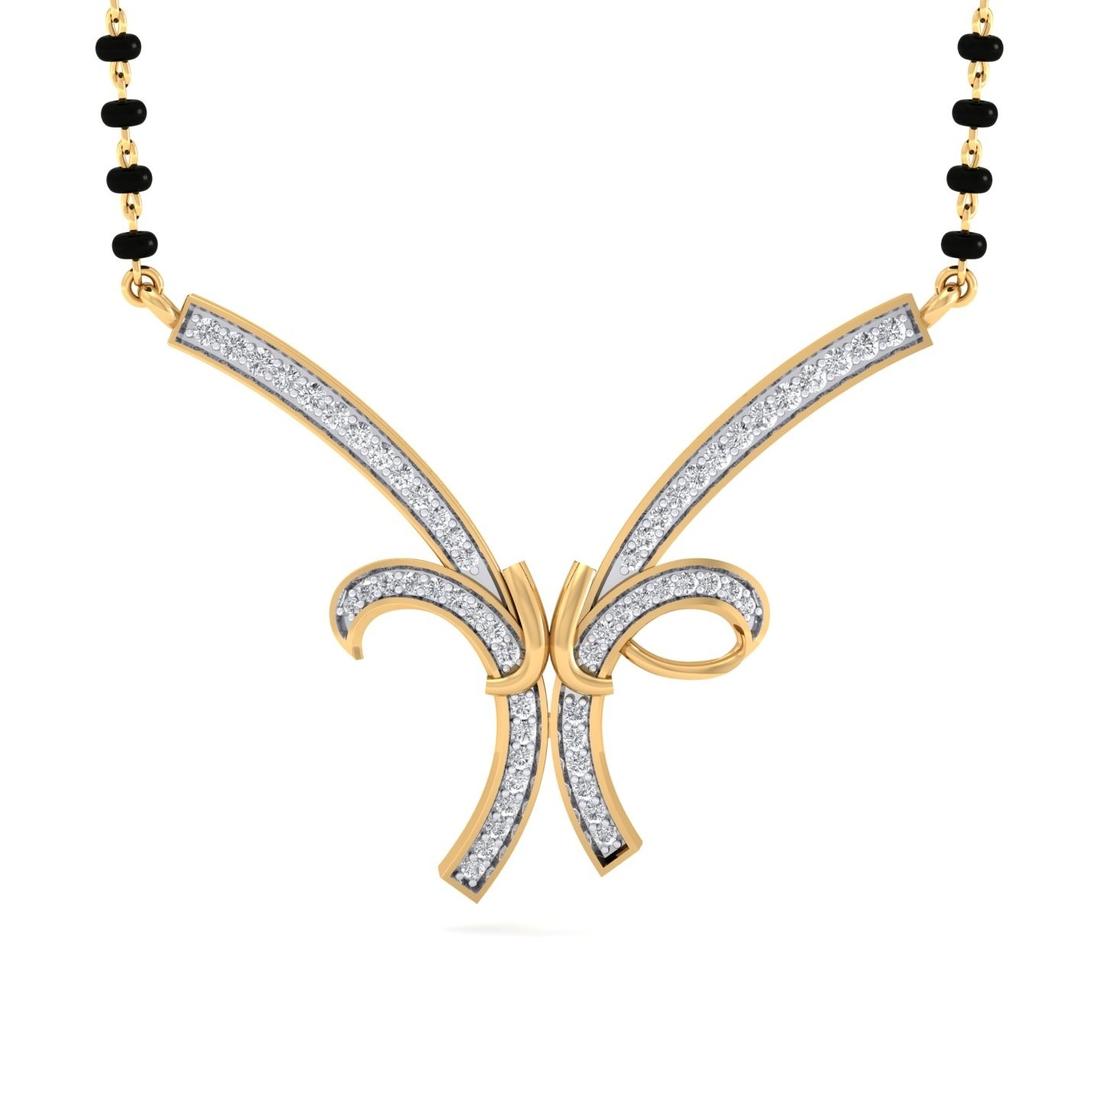 Sarvada Jewels' The Tirthaya Mangalsutra